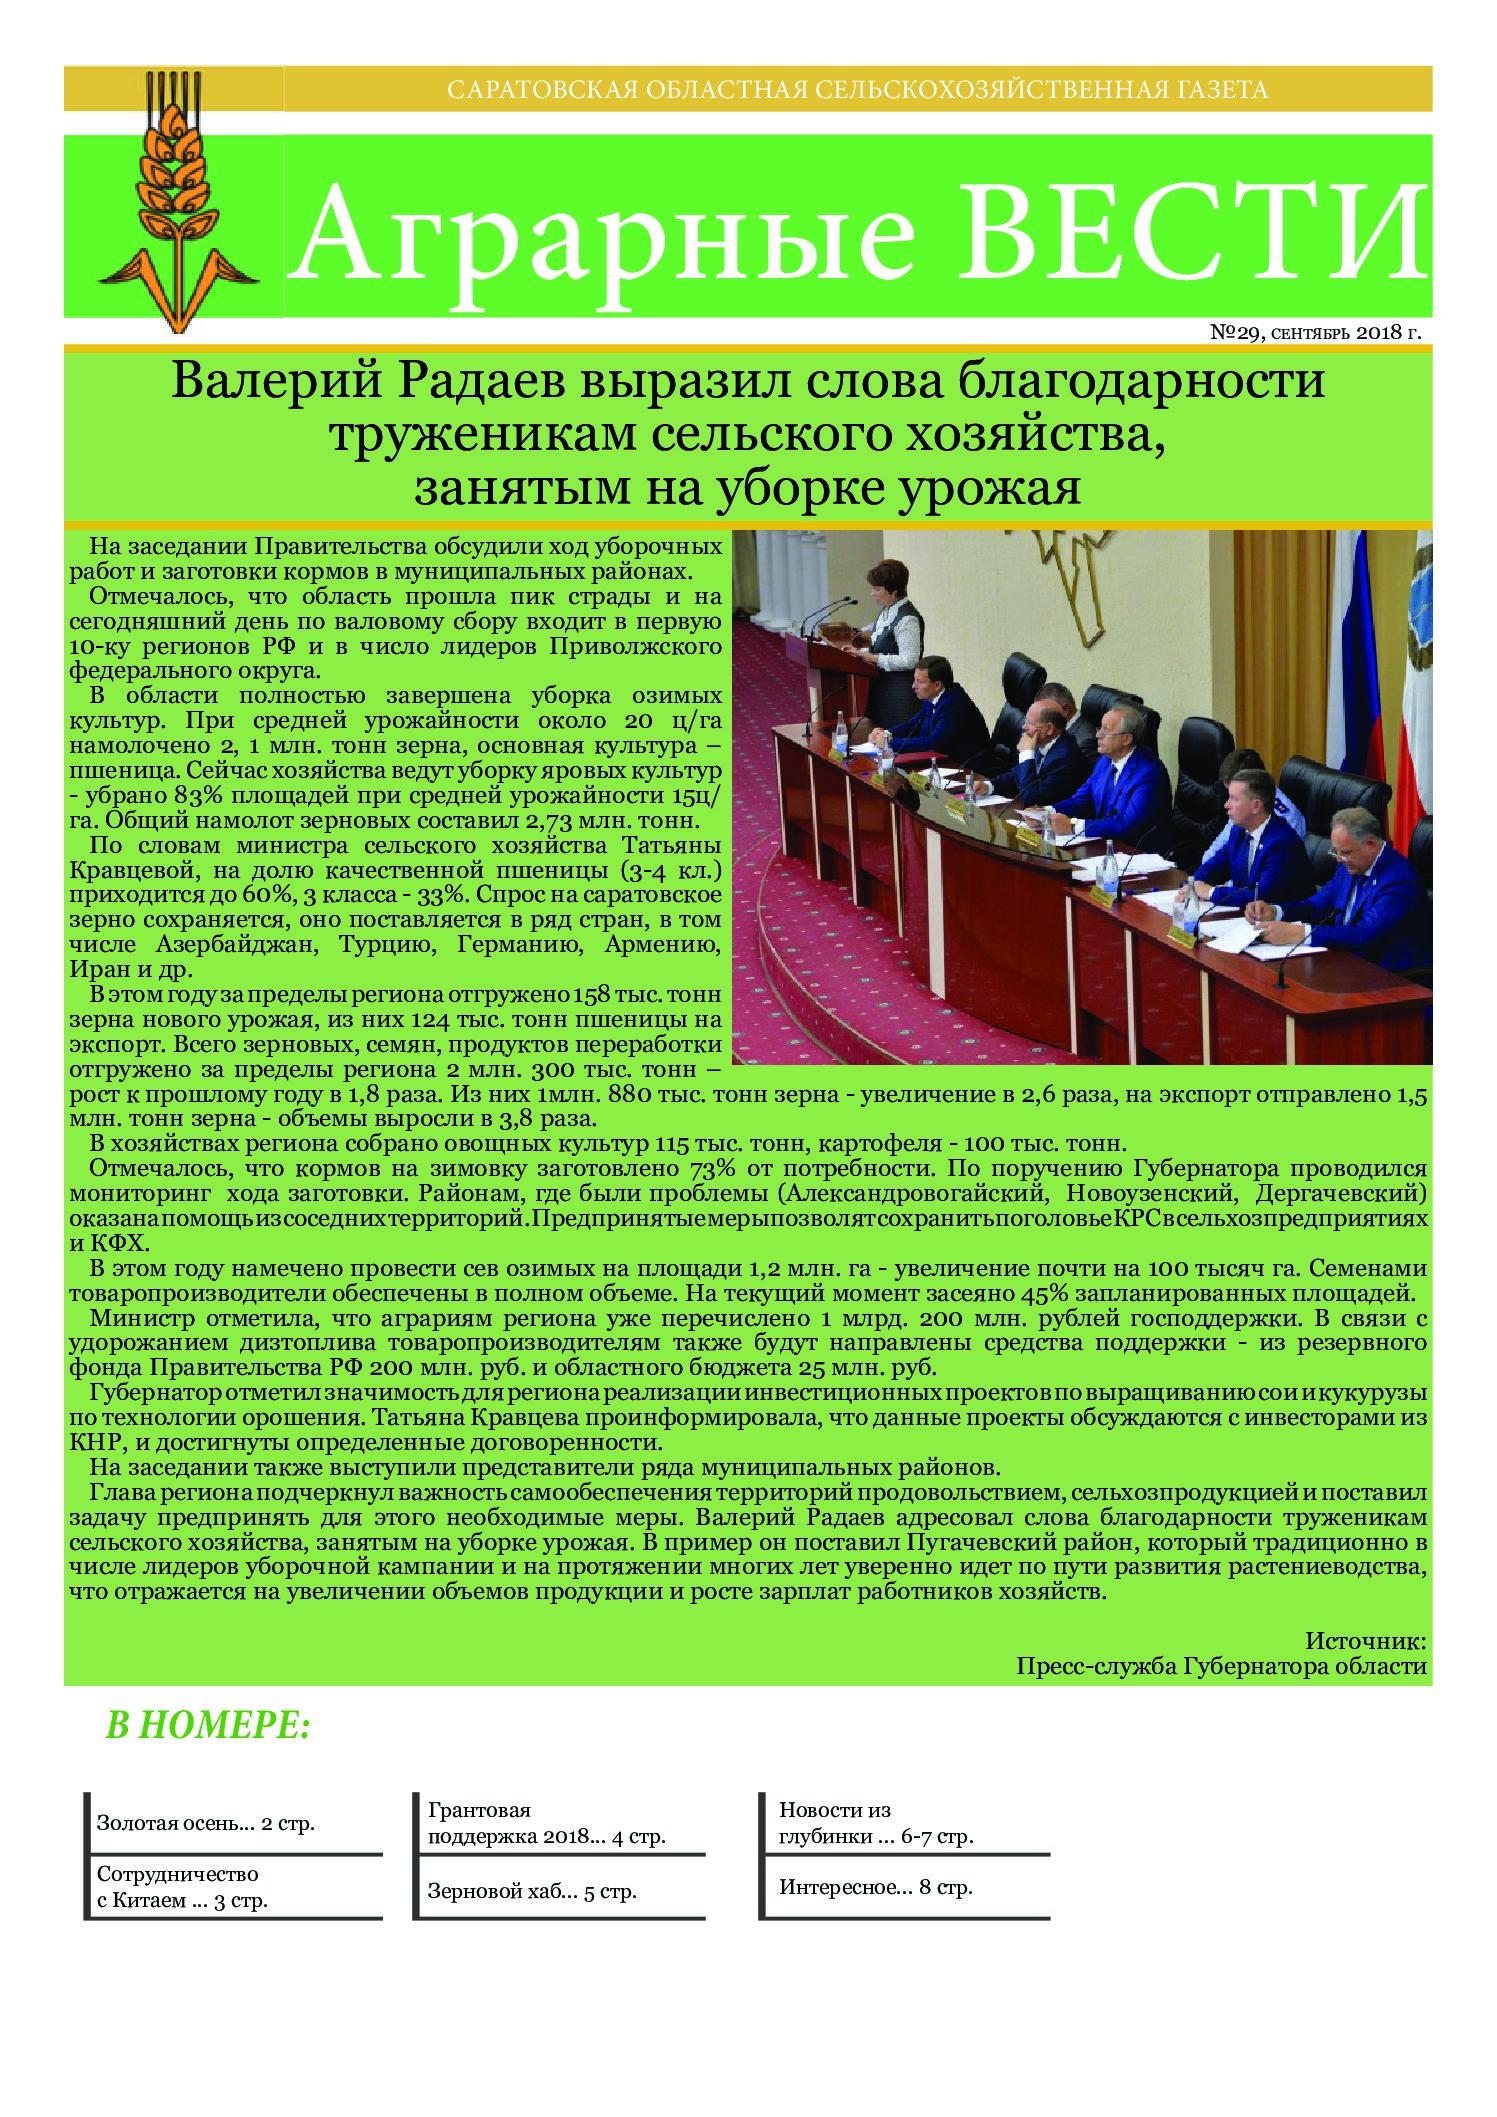 https://saratovagro.ru/wp-content/uploads/2020/08/8.2018-pdf.jpg